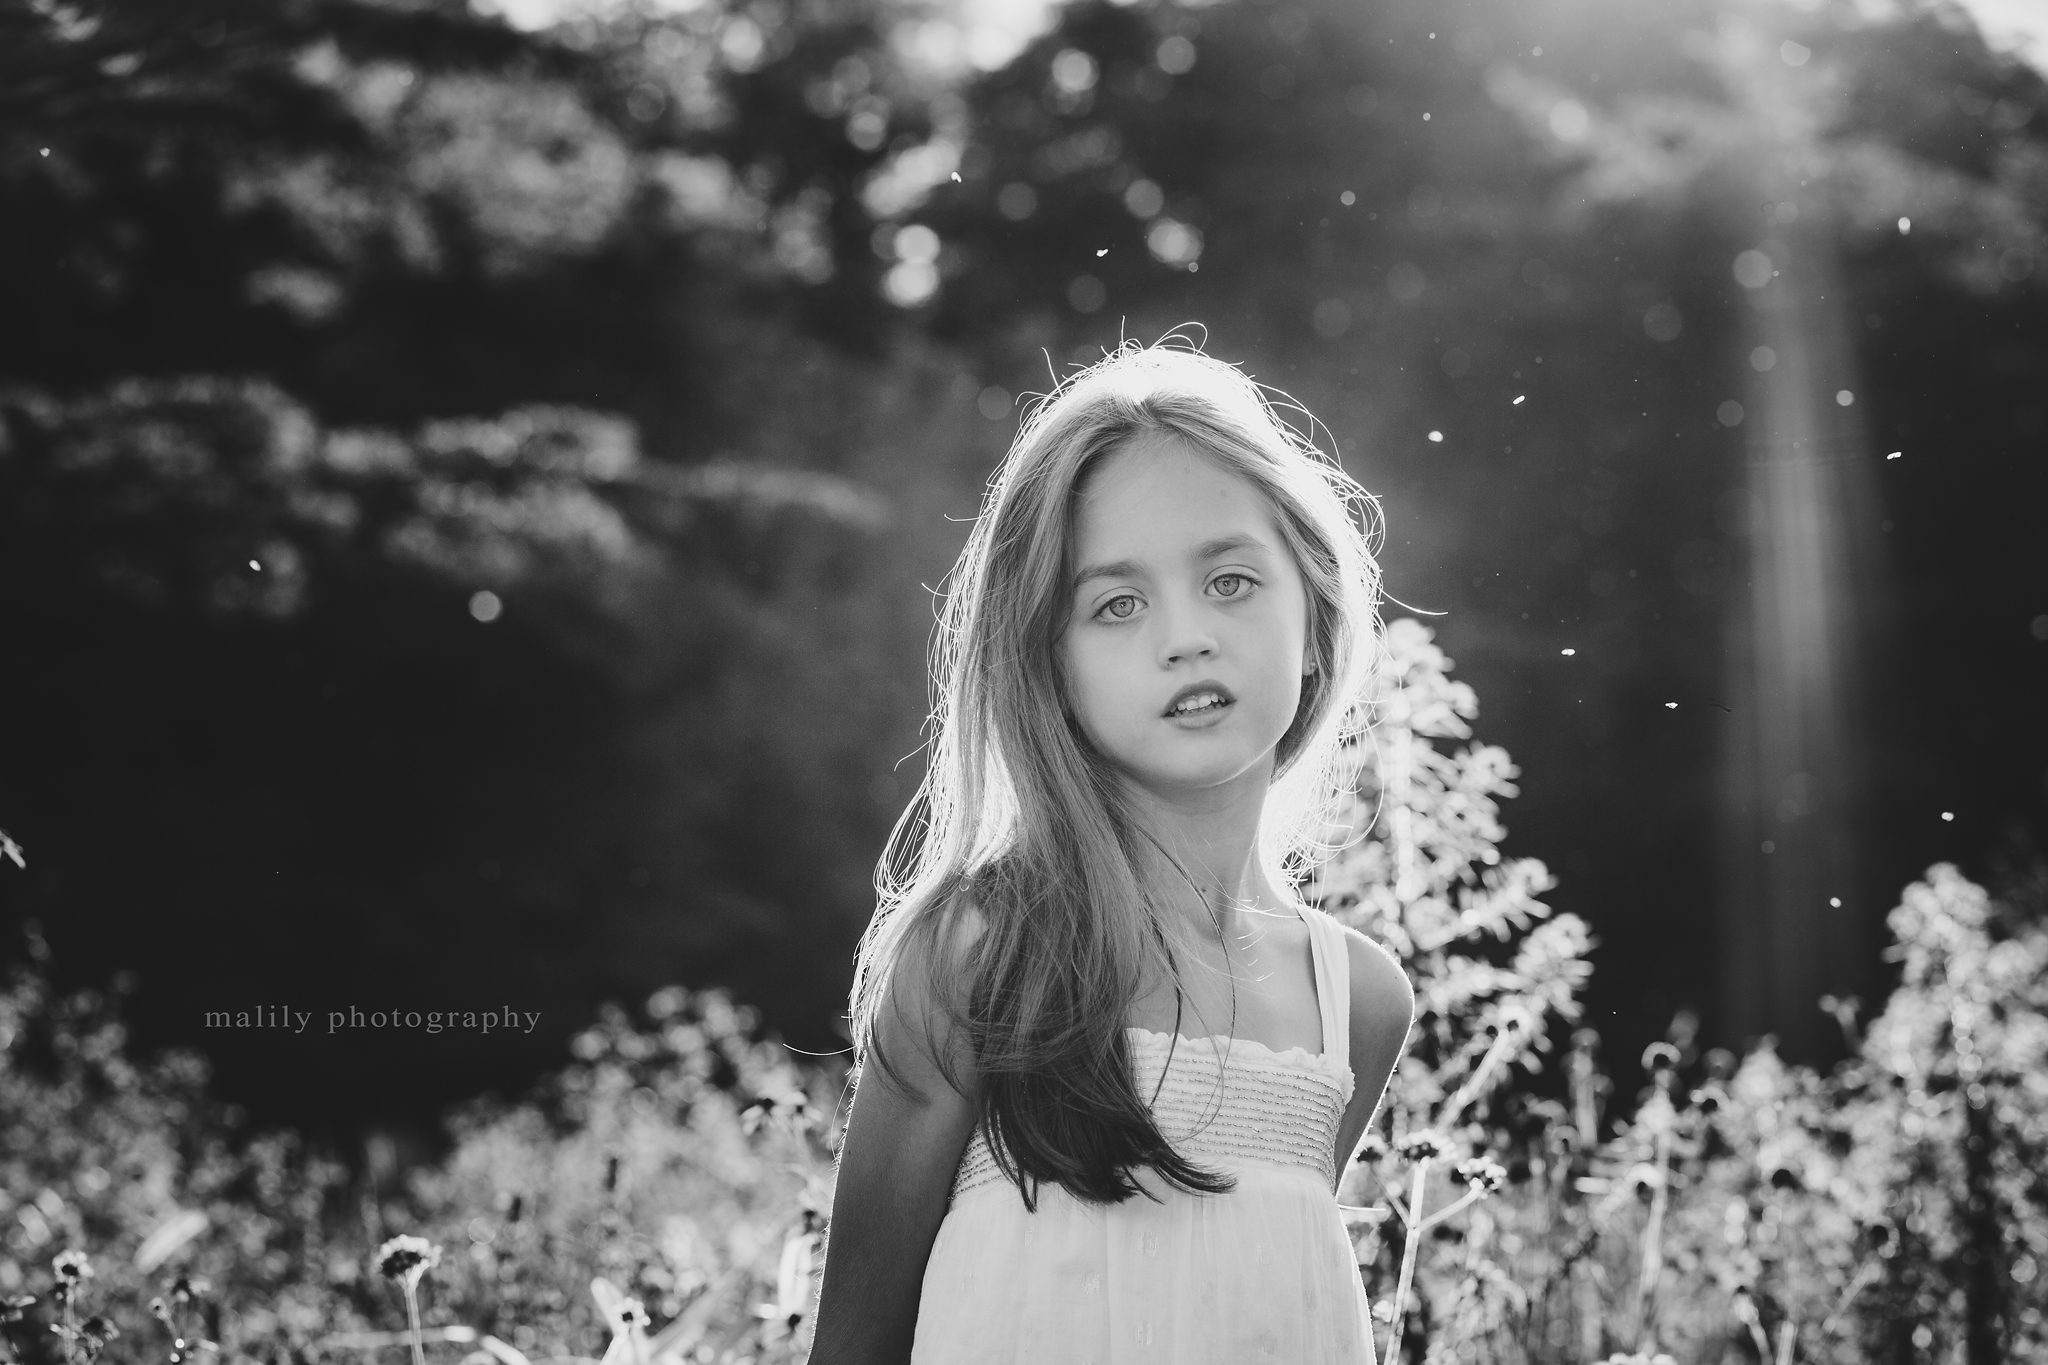 malily photography | Reading, PA Child Photography